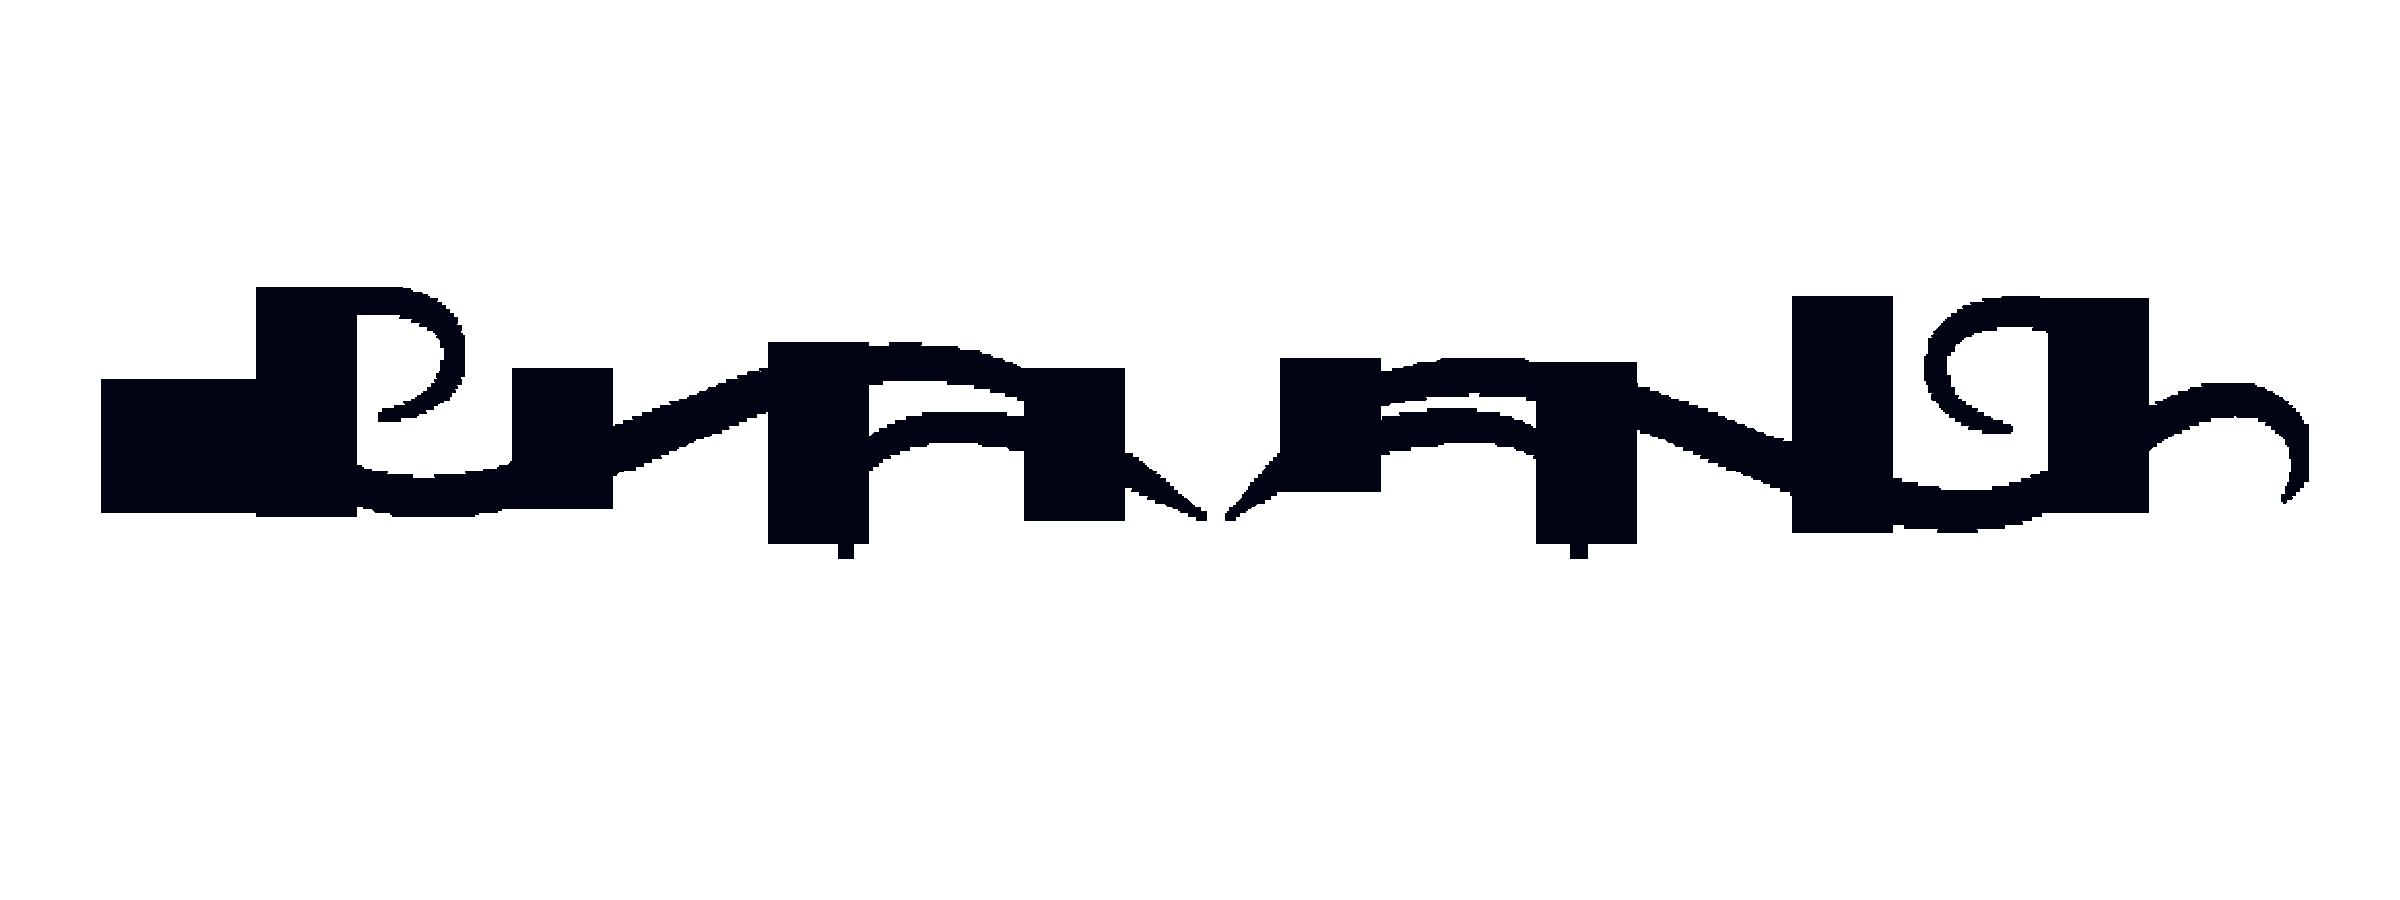 Simple scroll design ideal. Vines clipart swirl